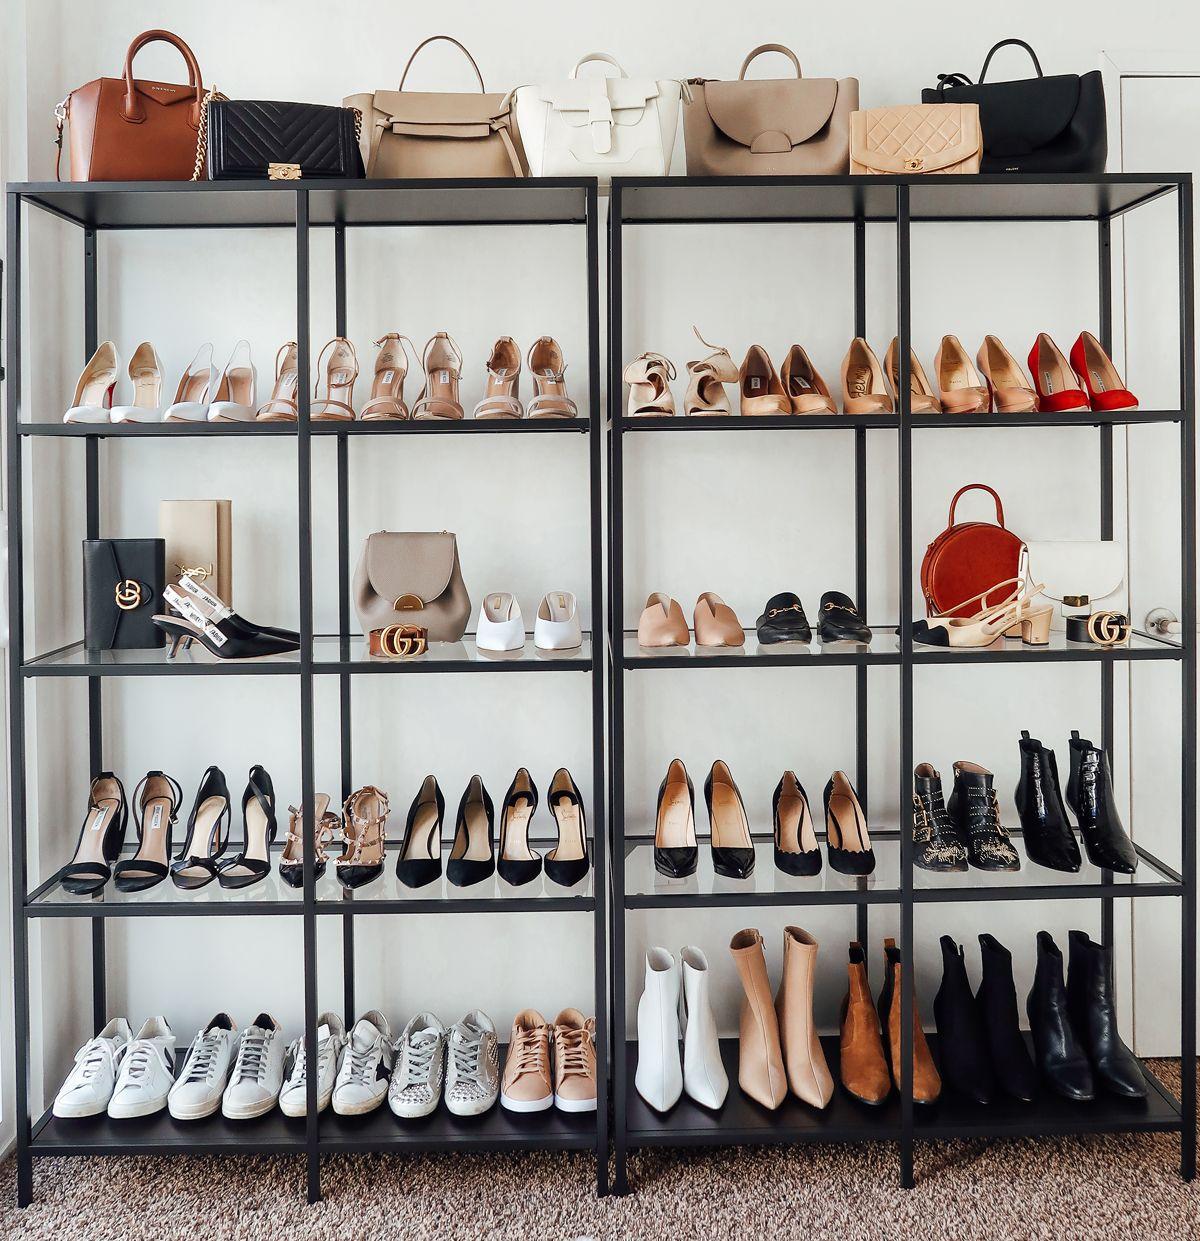 My Handbag Shoe Collection Handbag Shoes Shoe Collection